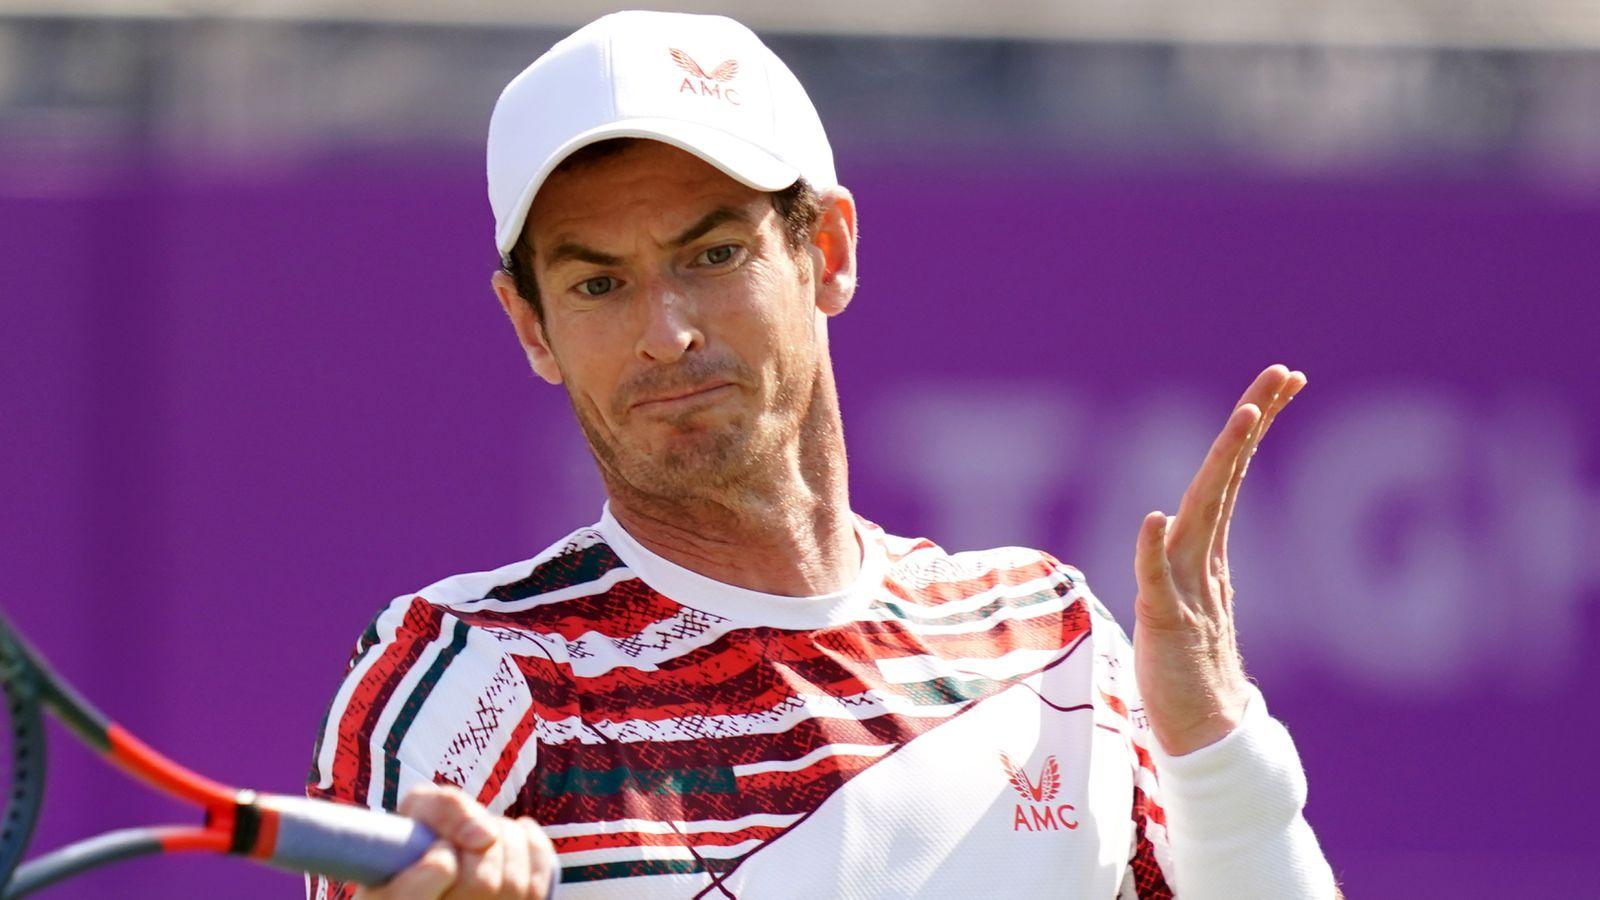 skysports andy murray tennis 5416054 - Andy Murray čez prvo oviro v Wimbledonu